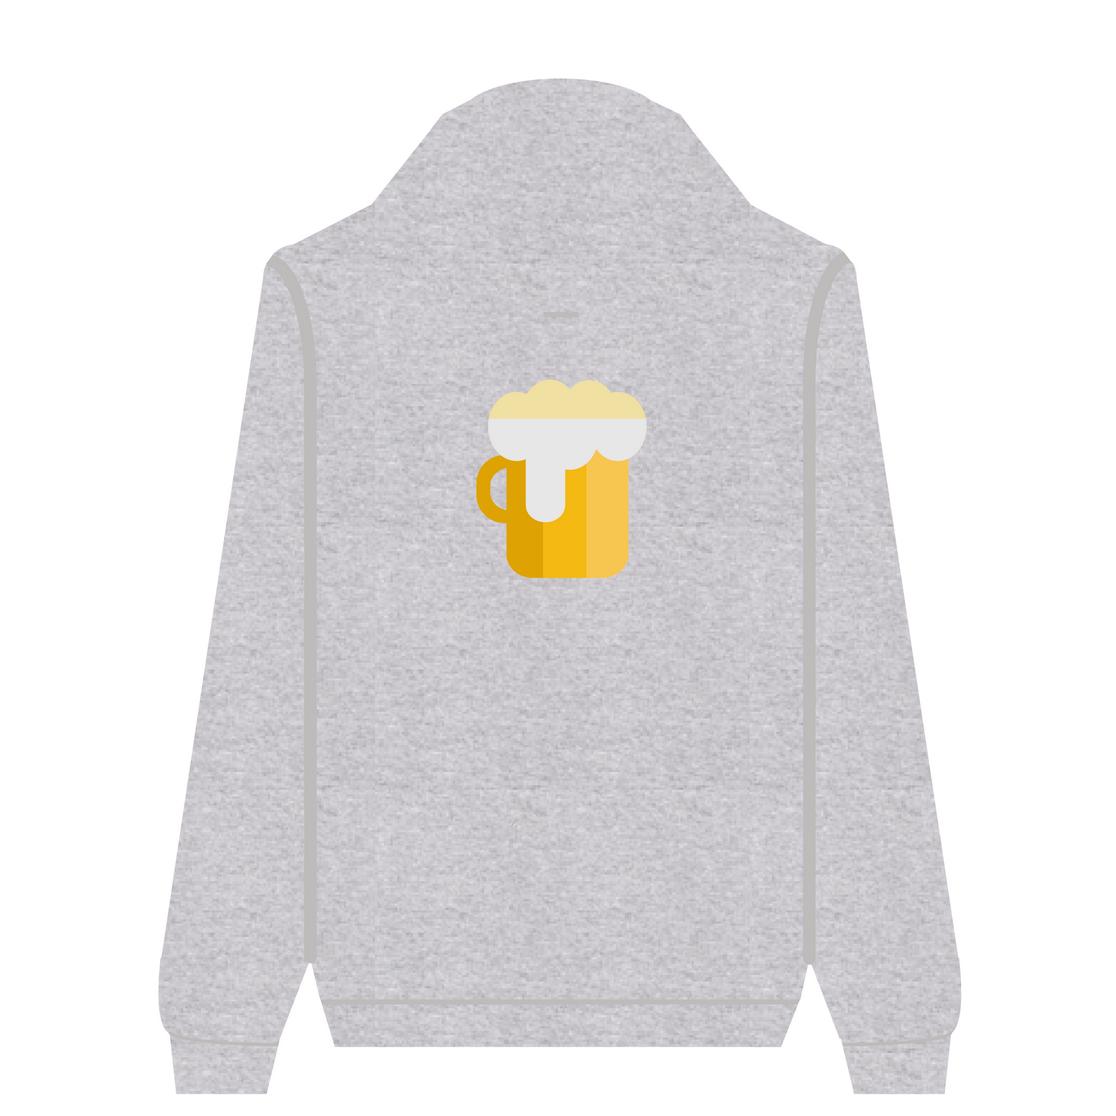 Full Zip Hoodie Beer | Wuzzee